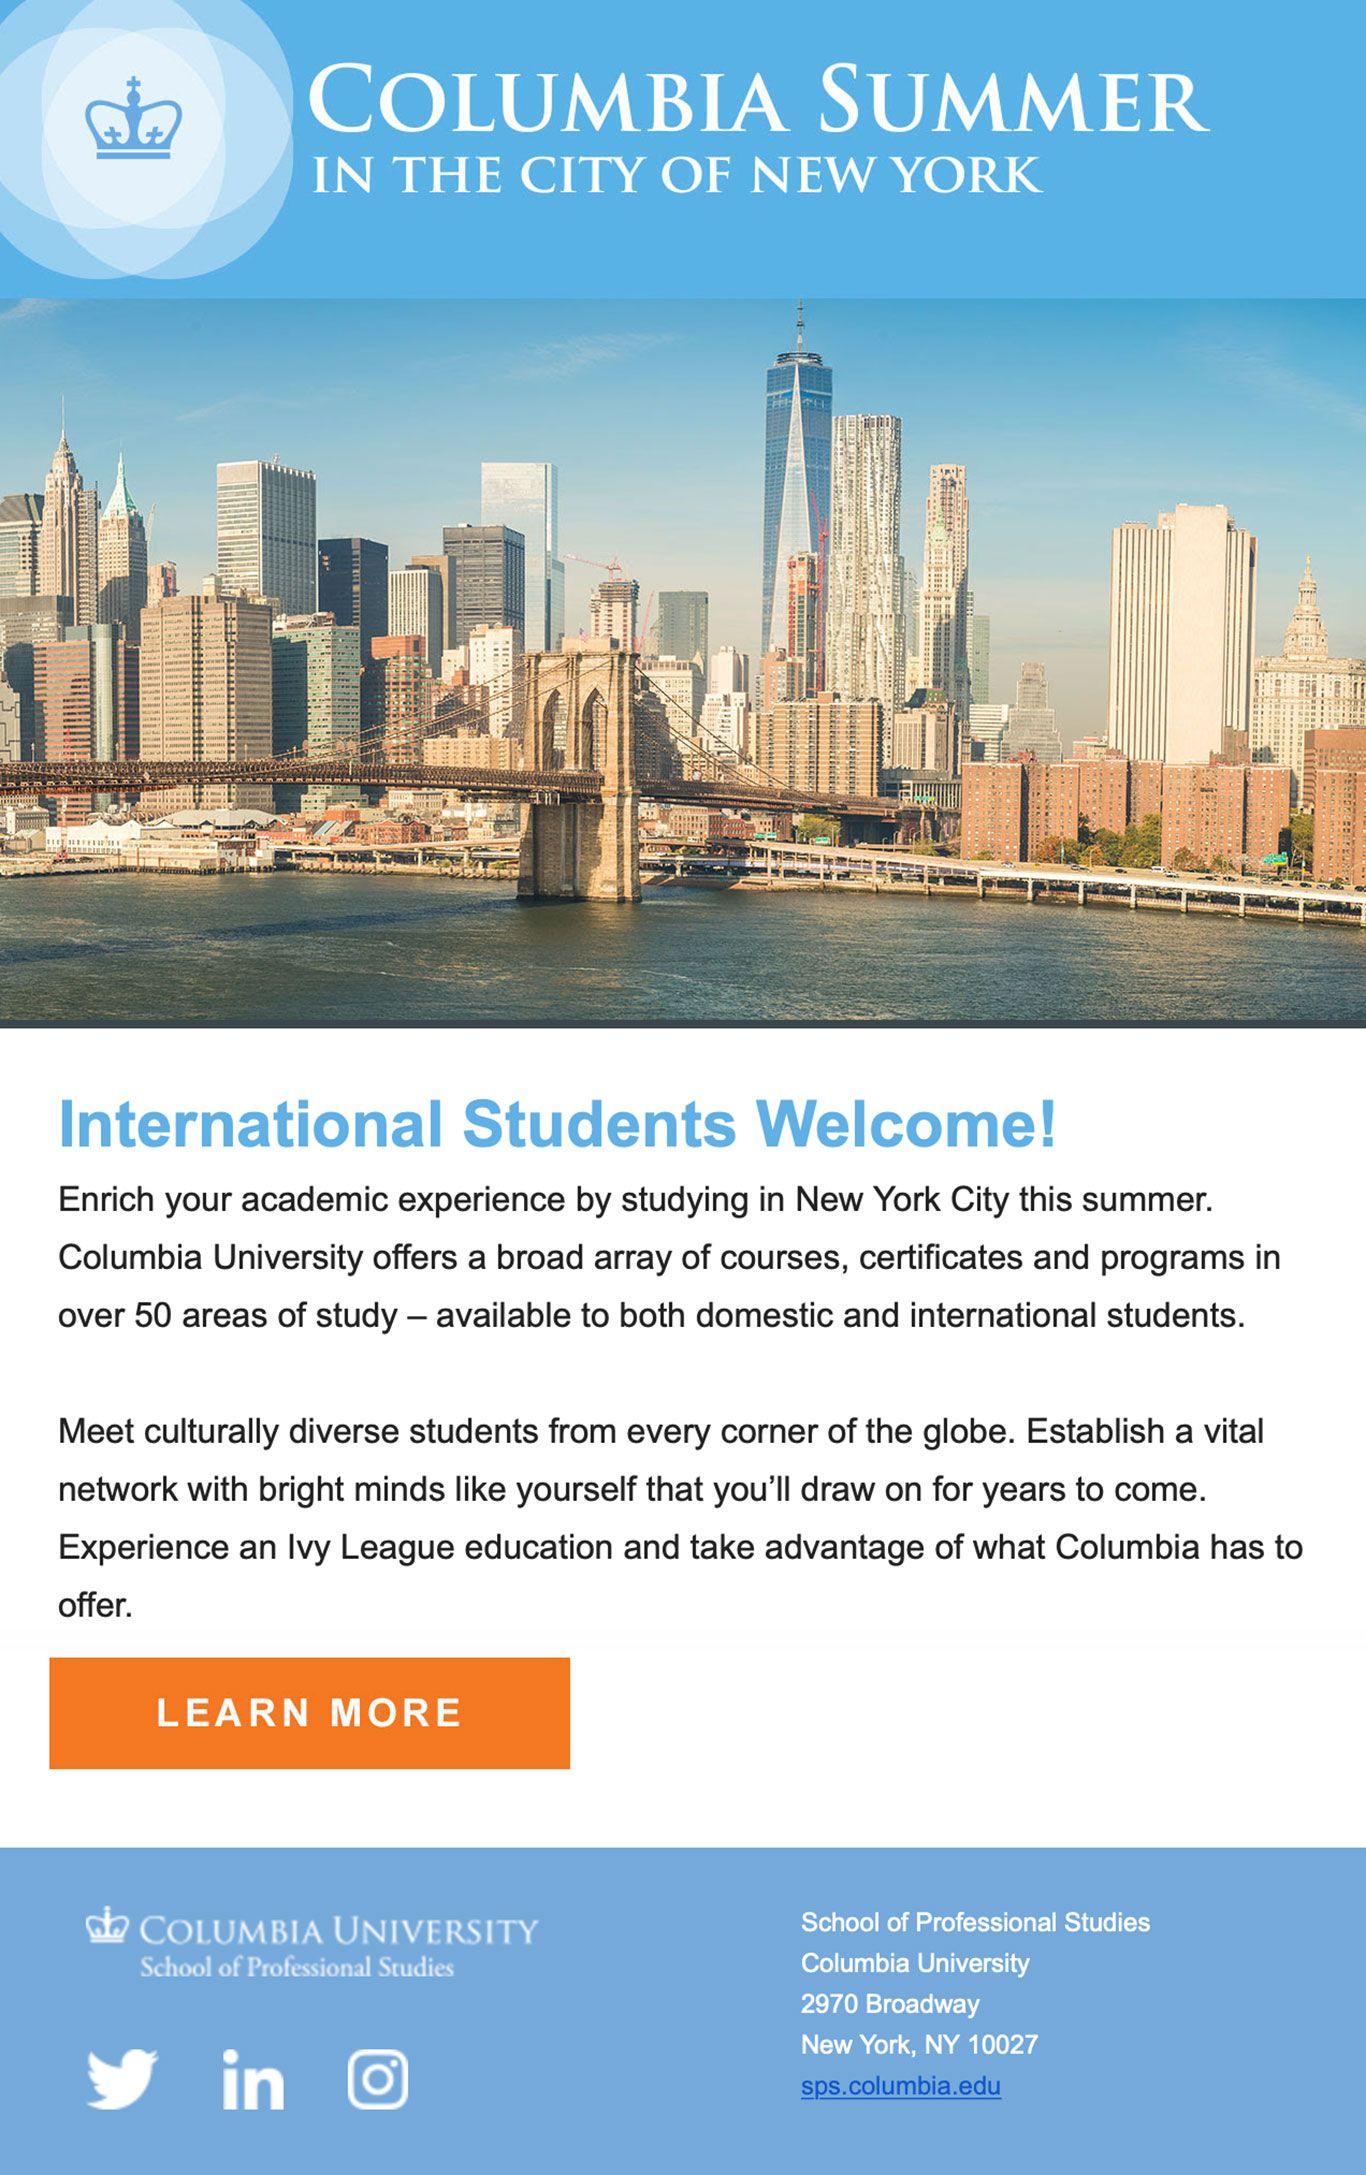 Email Marketing Sample for Columbia University Image